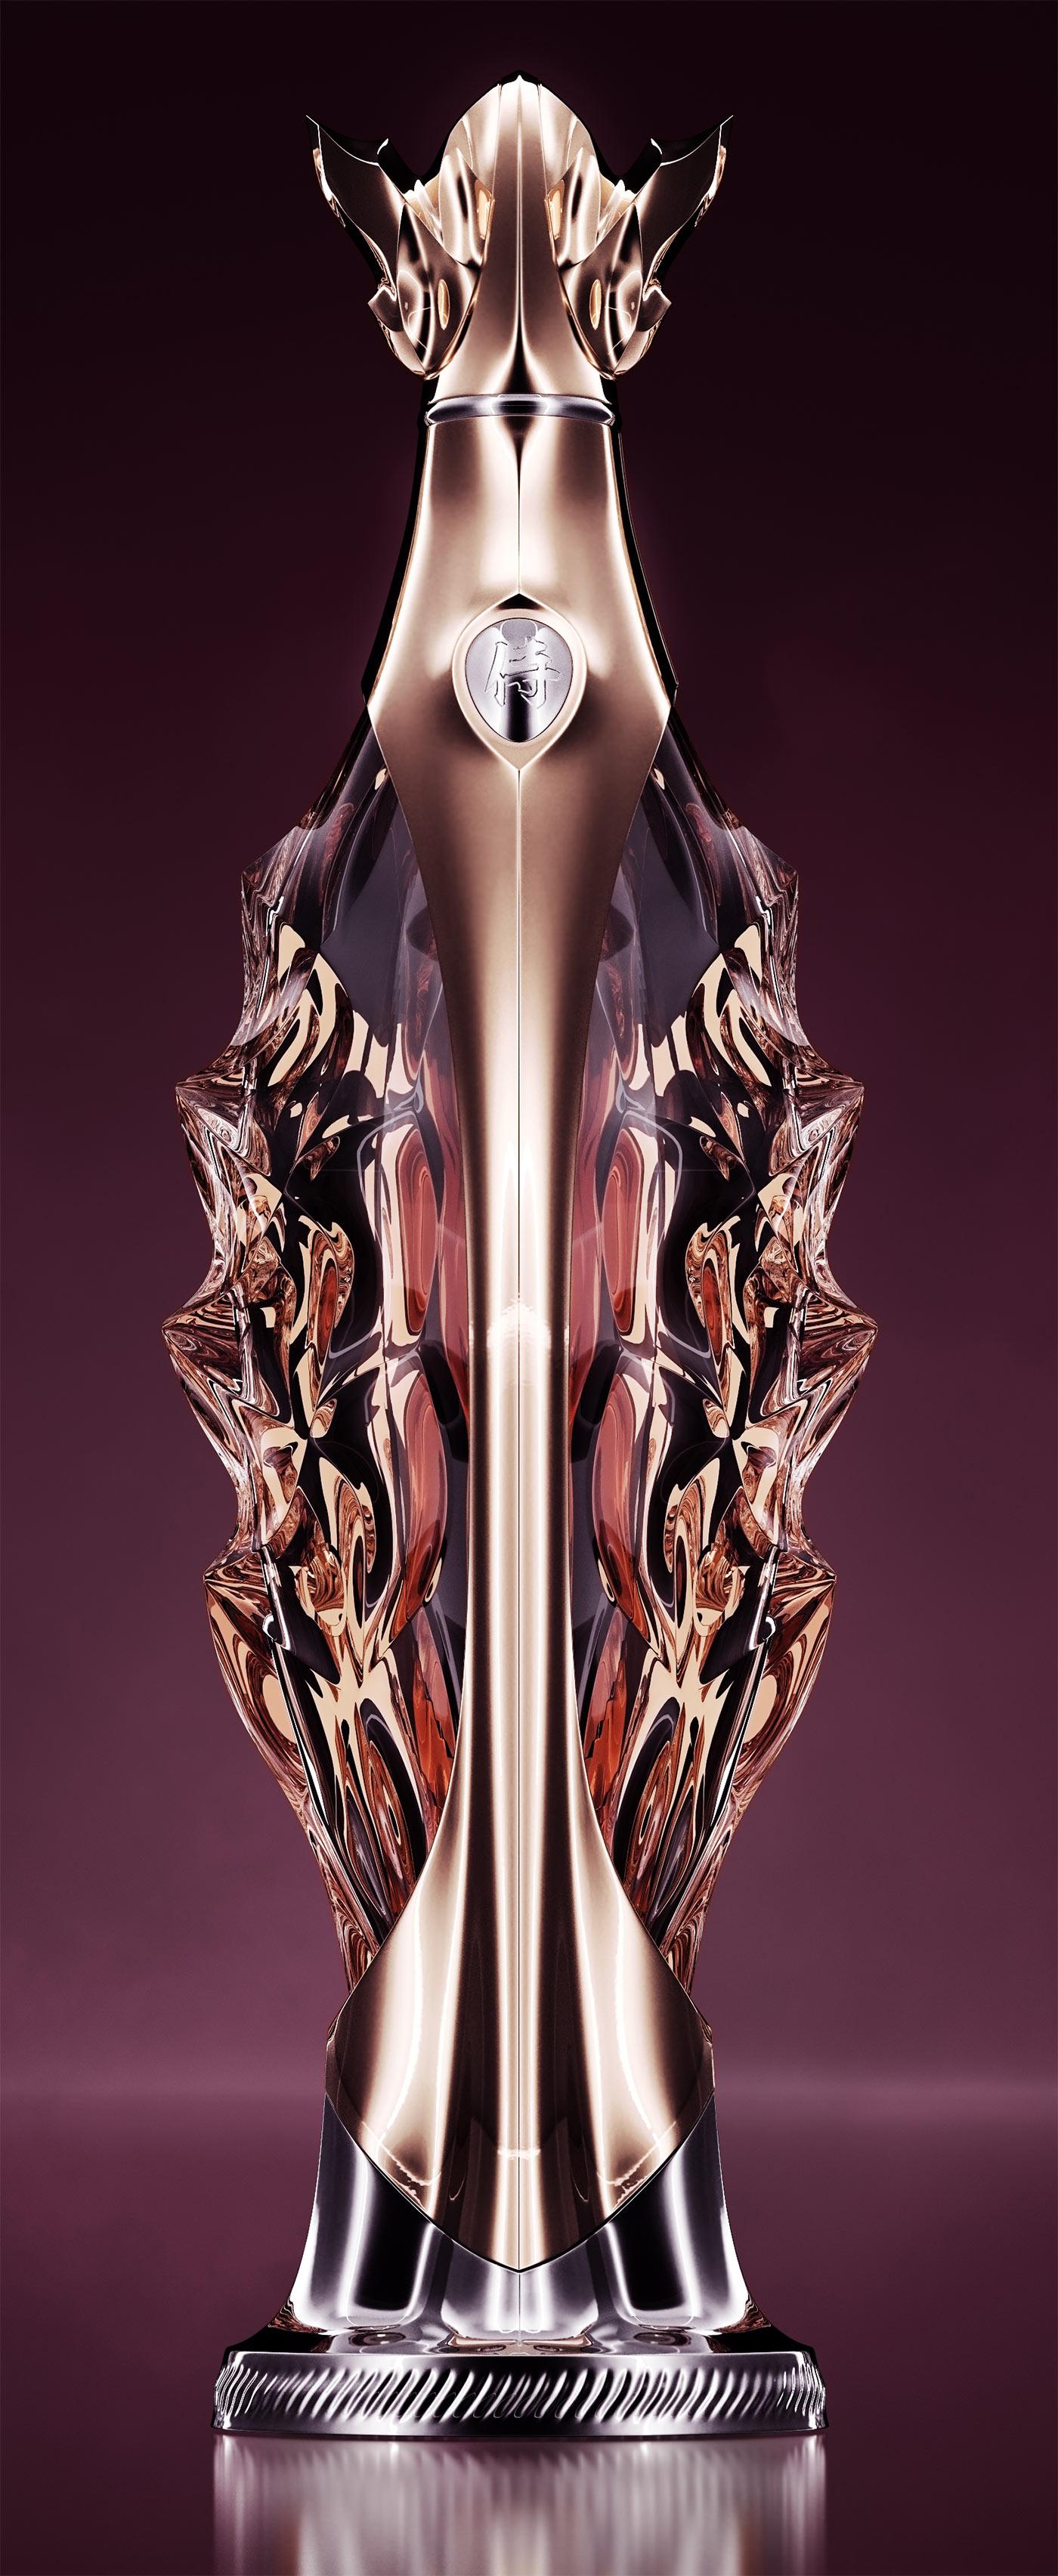 Luxury Whiskey Bottle Concept 6